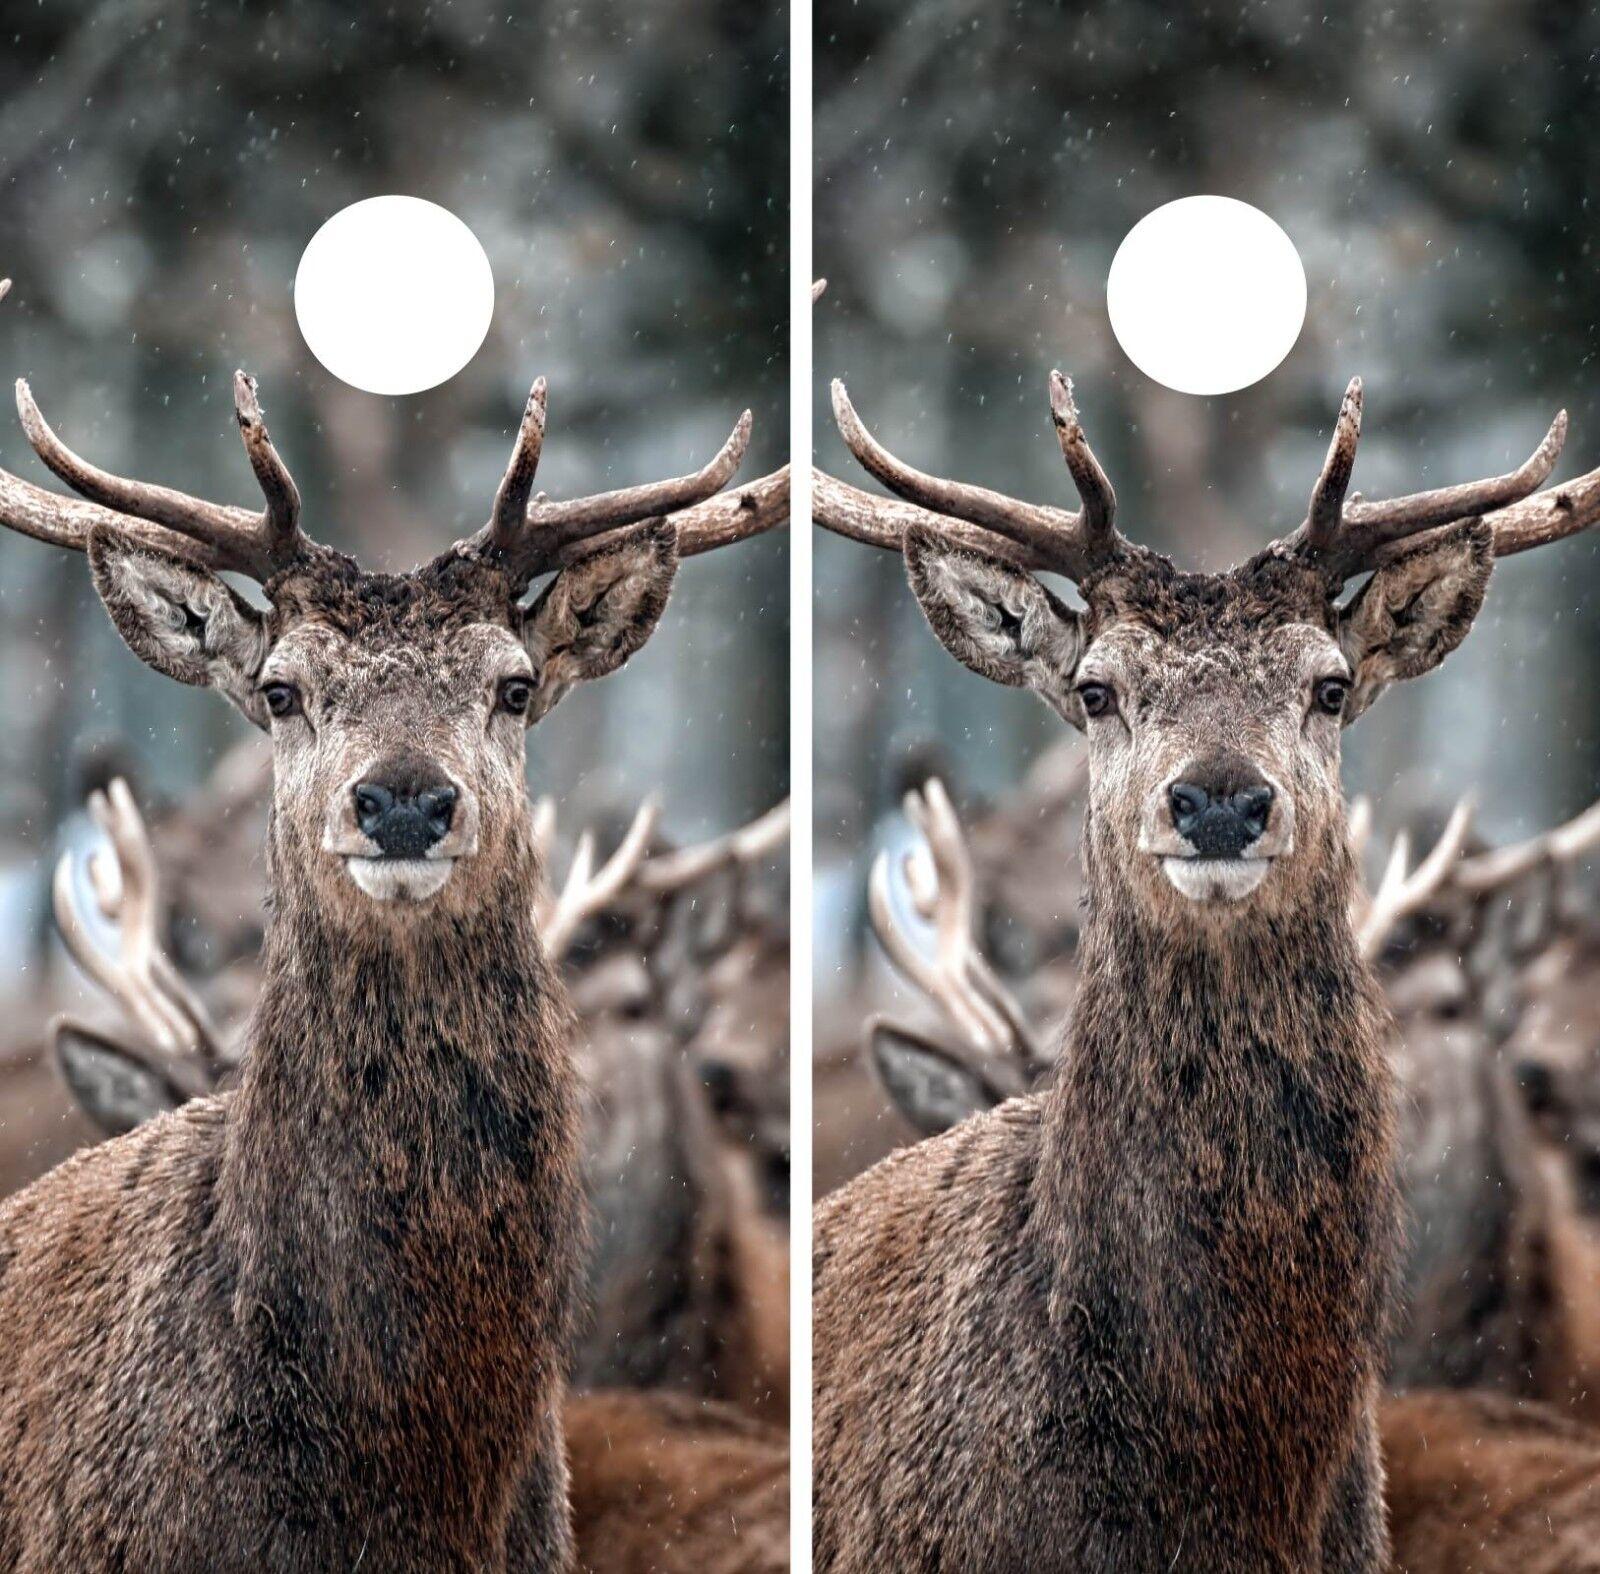 Deer Cornhole Hunting Camouflage Wrap Game  Board Skin Set Vinyl Art Decor CO169  new style